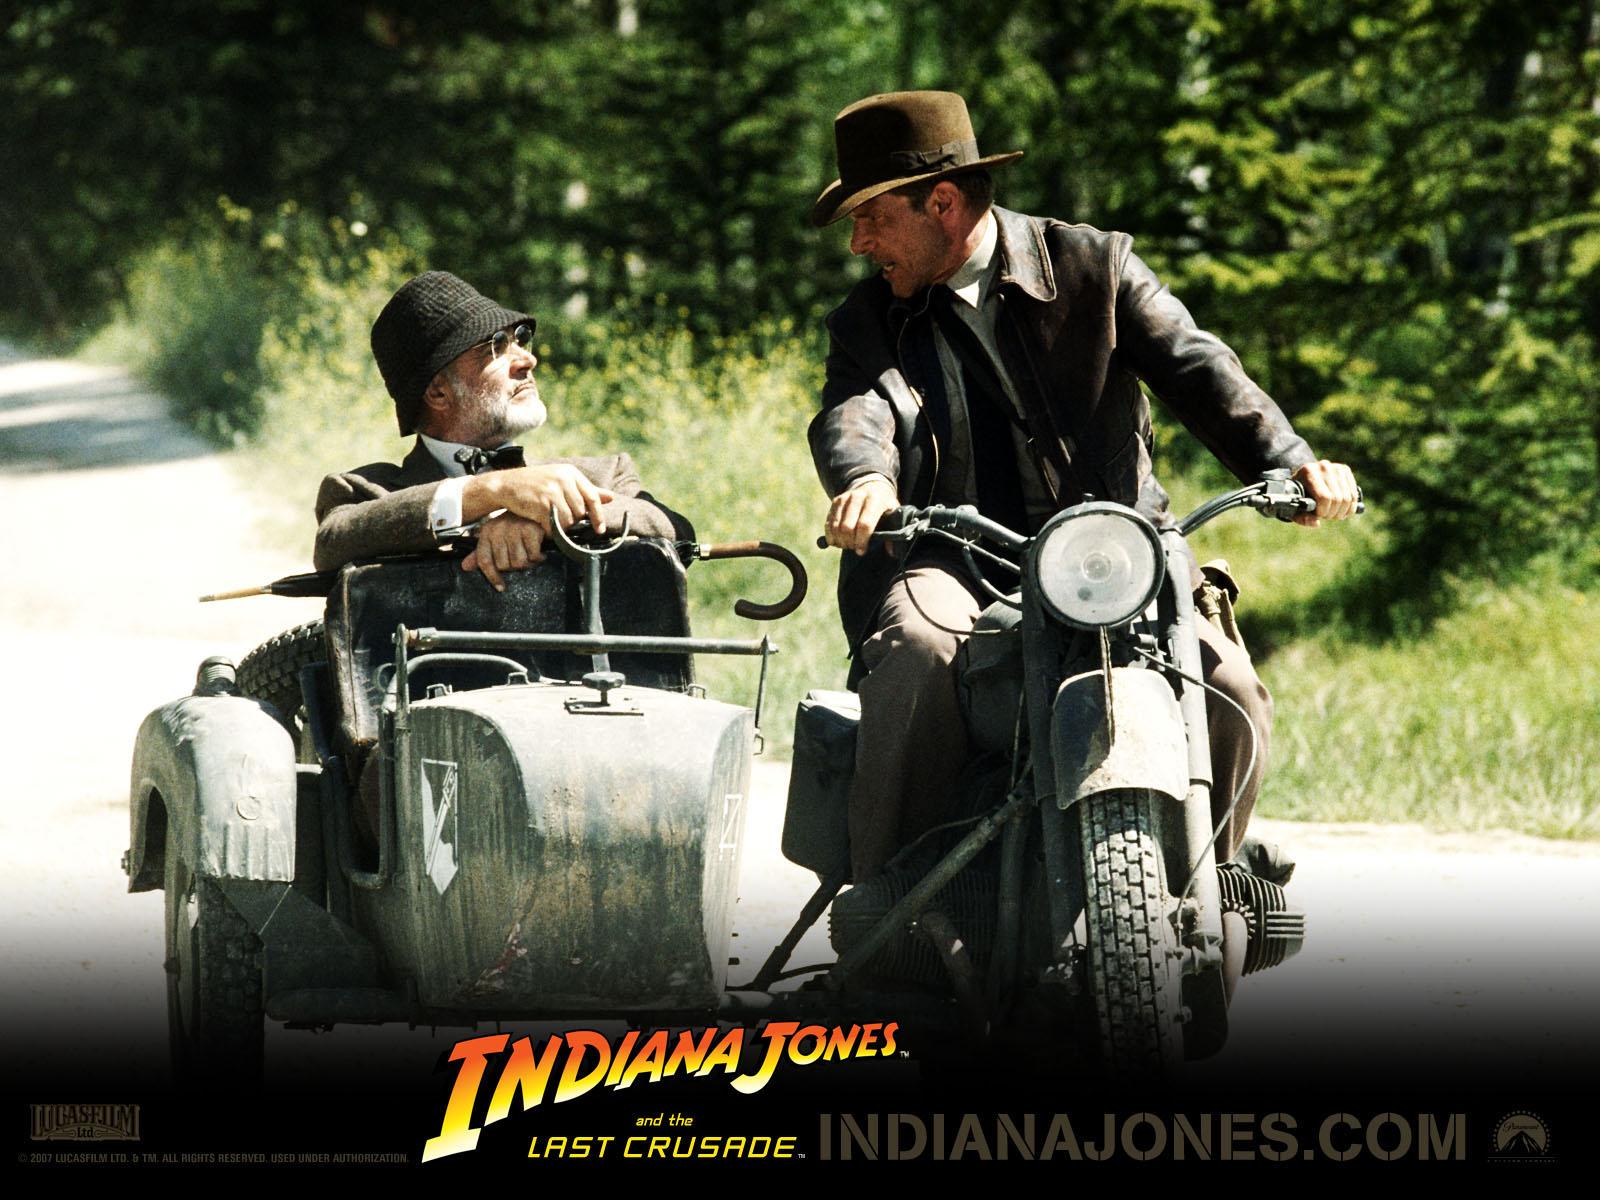 Picture Indiana Jones Indiana Jones and the Last Crusade film Movies